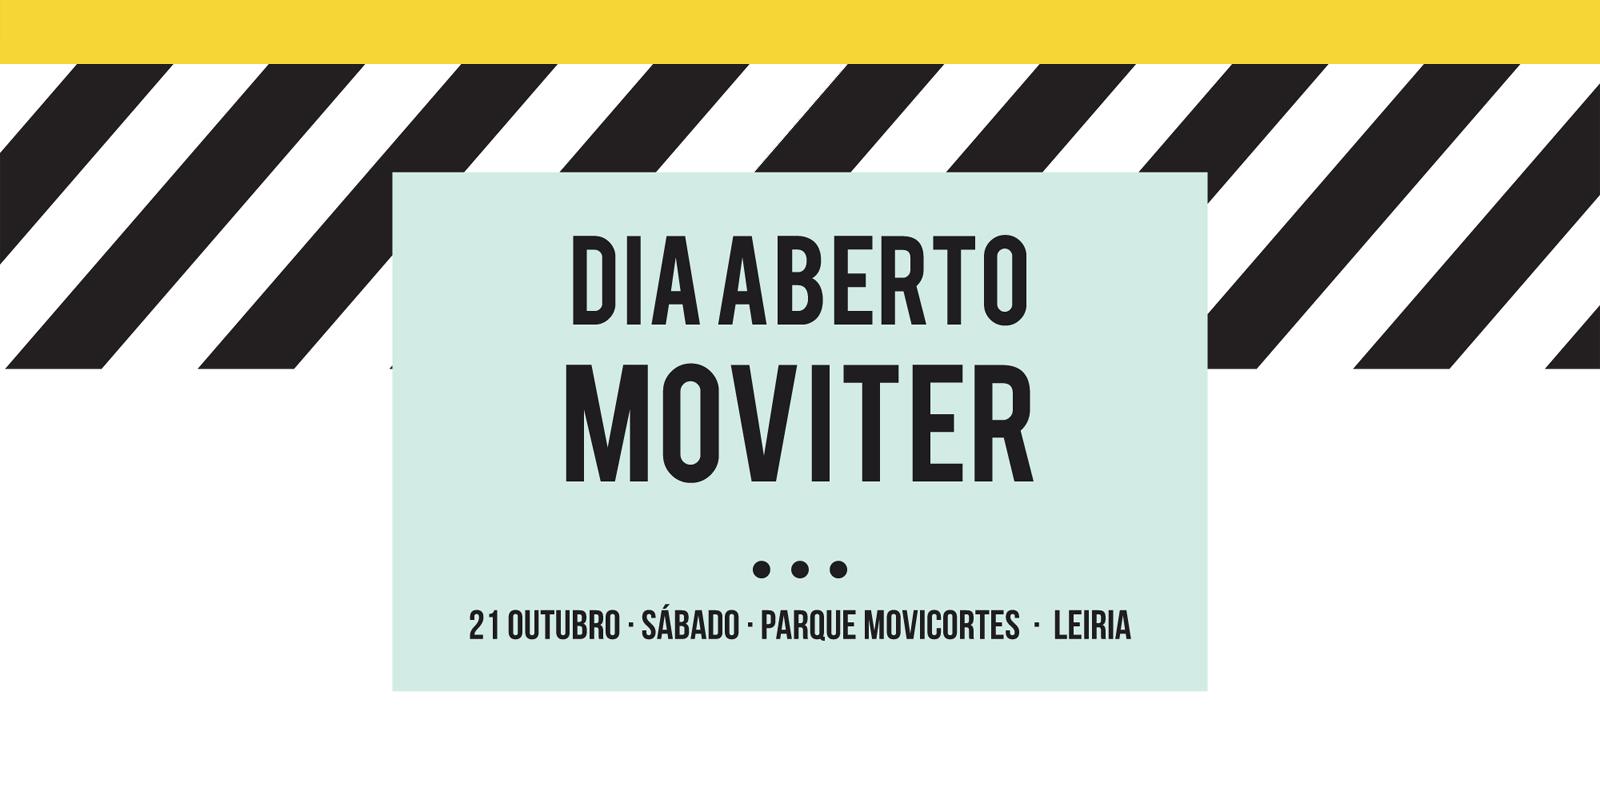 DiaAbertoMoviter2017